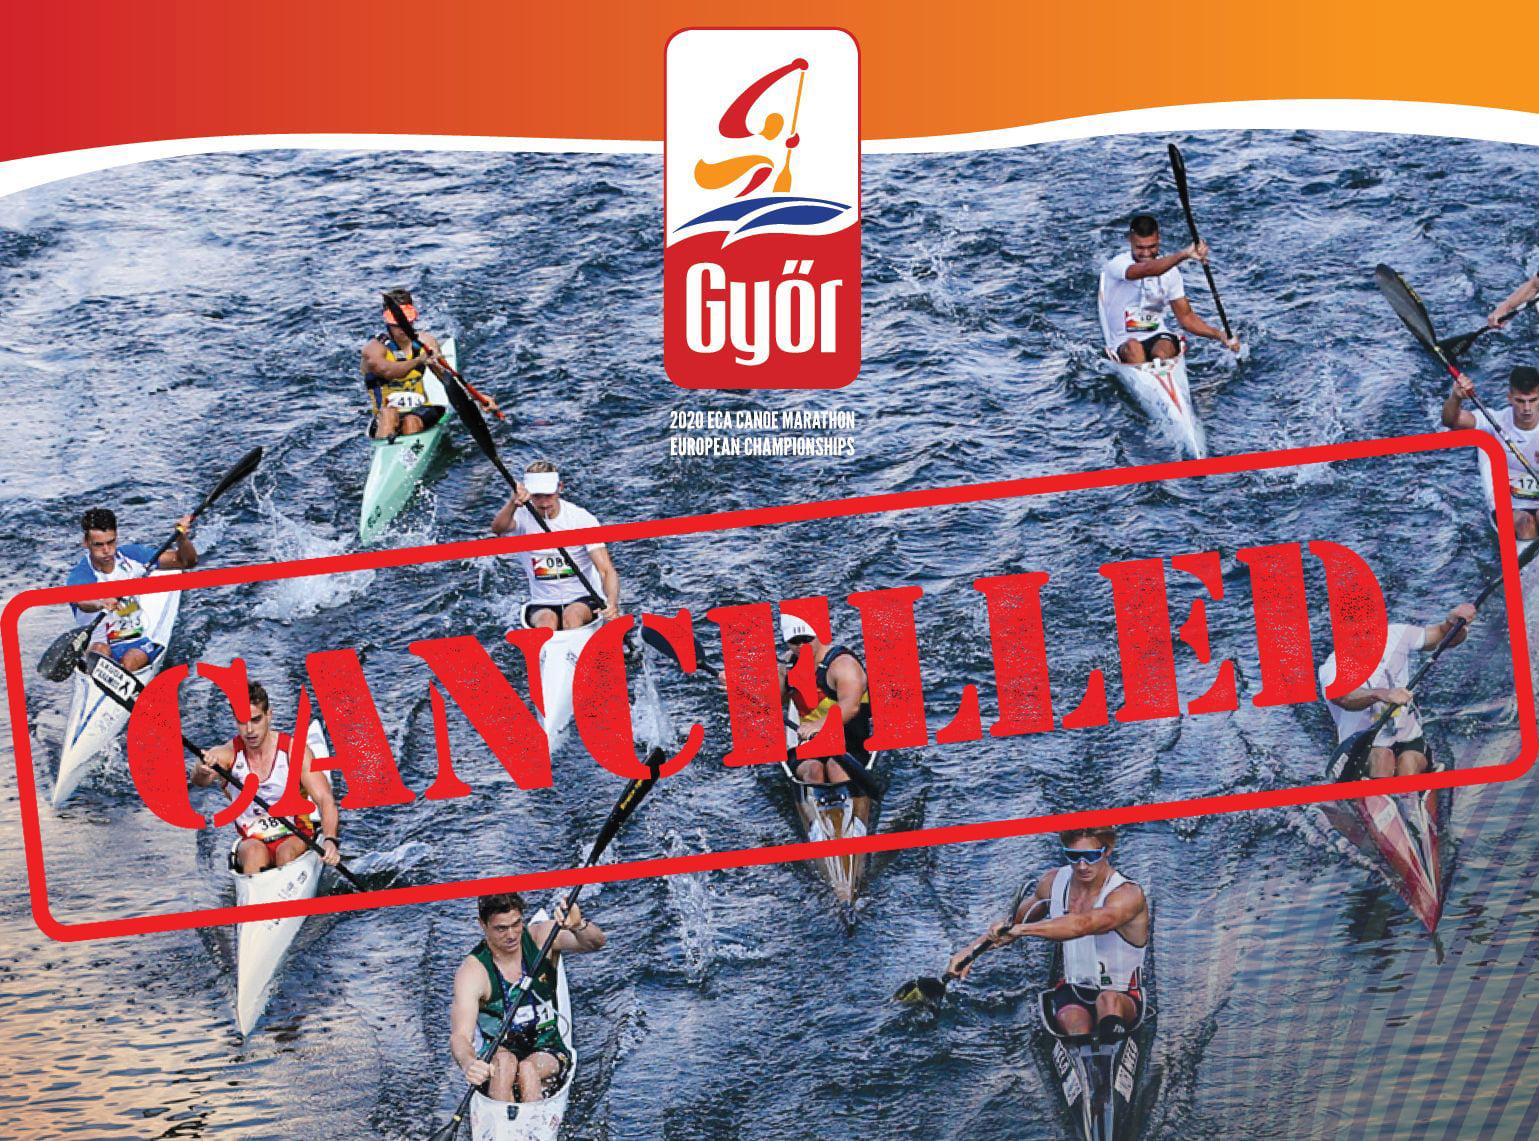 Kanu-Marathon-Europameisterschaften in Győr wegen Corona abgesagt post's picture